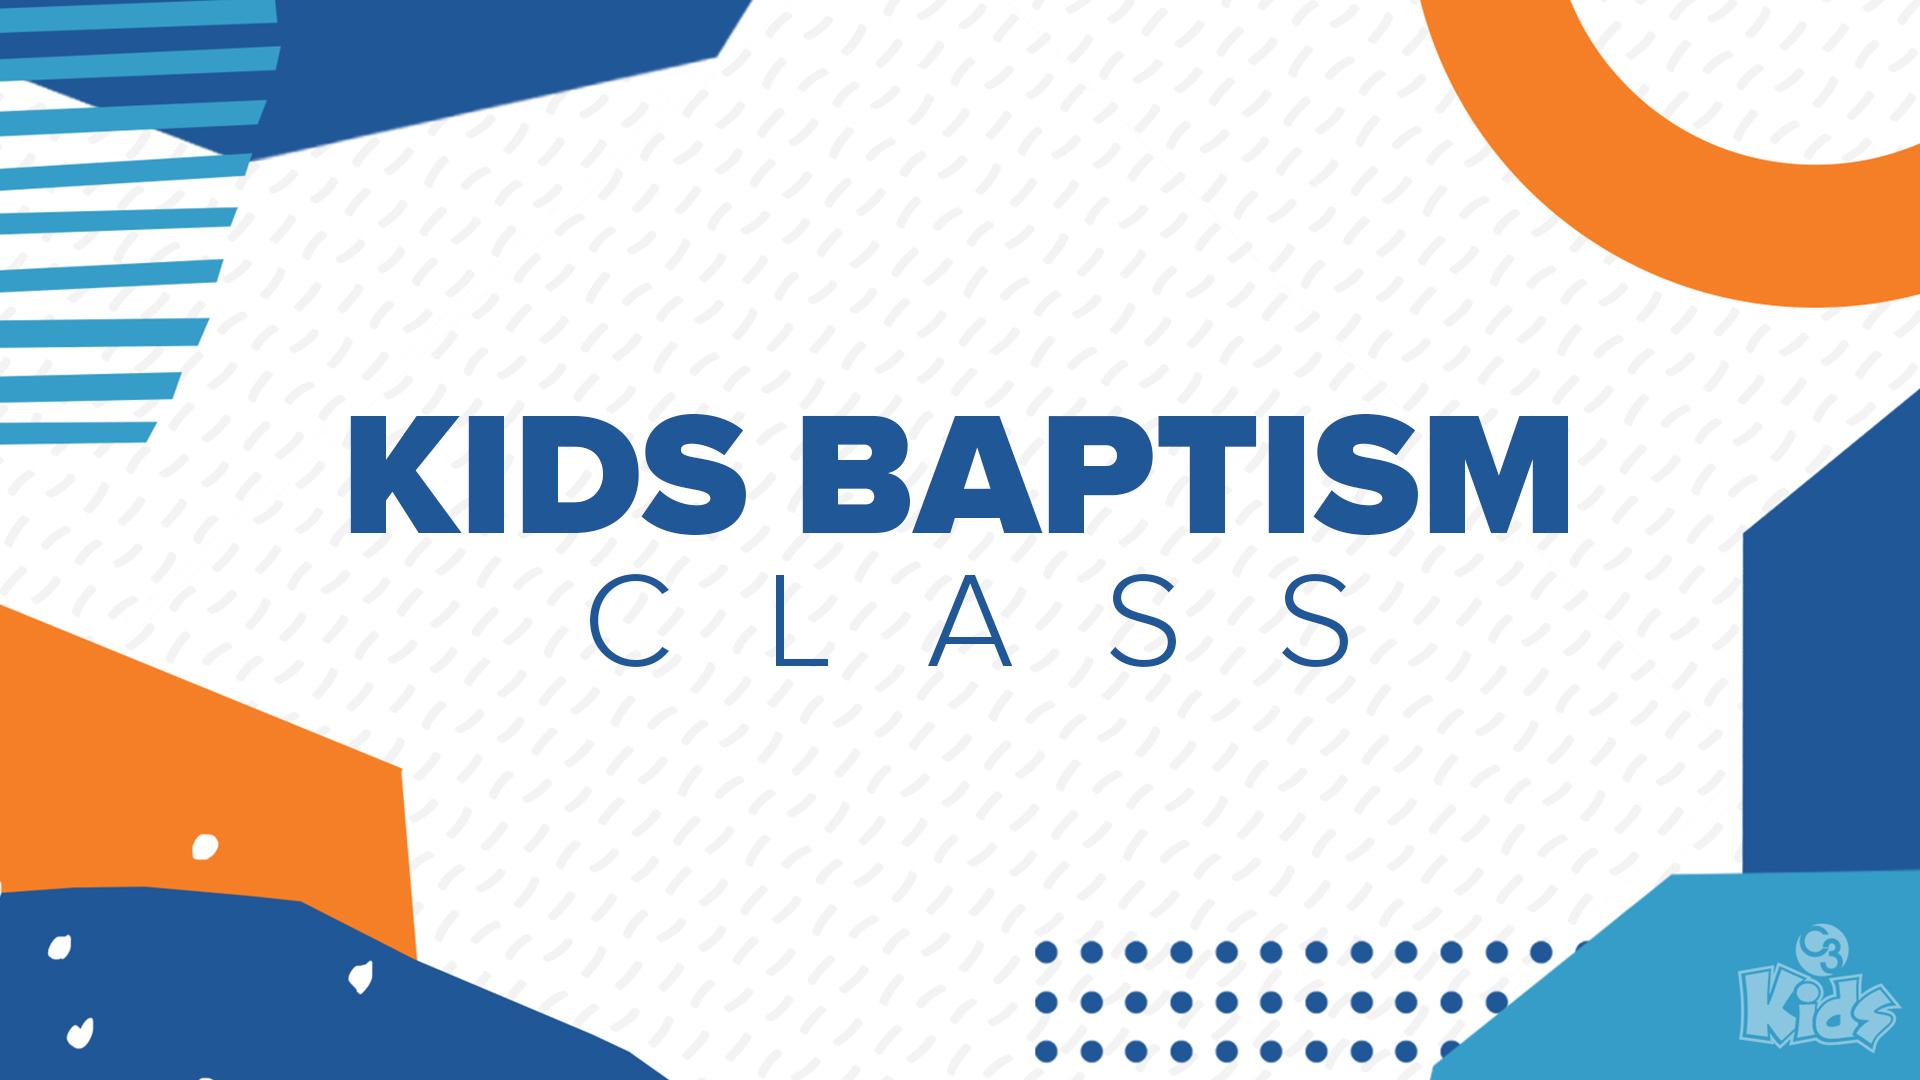 Kidsbaptism